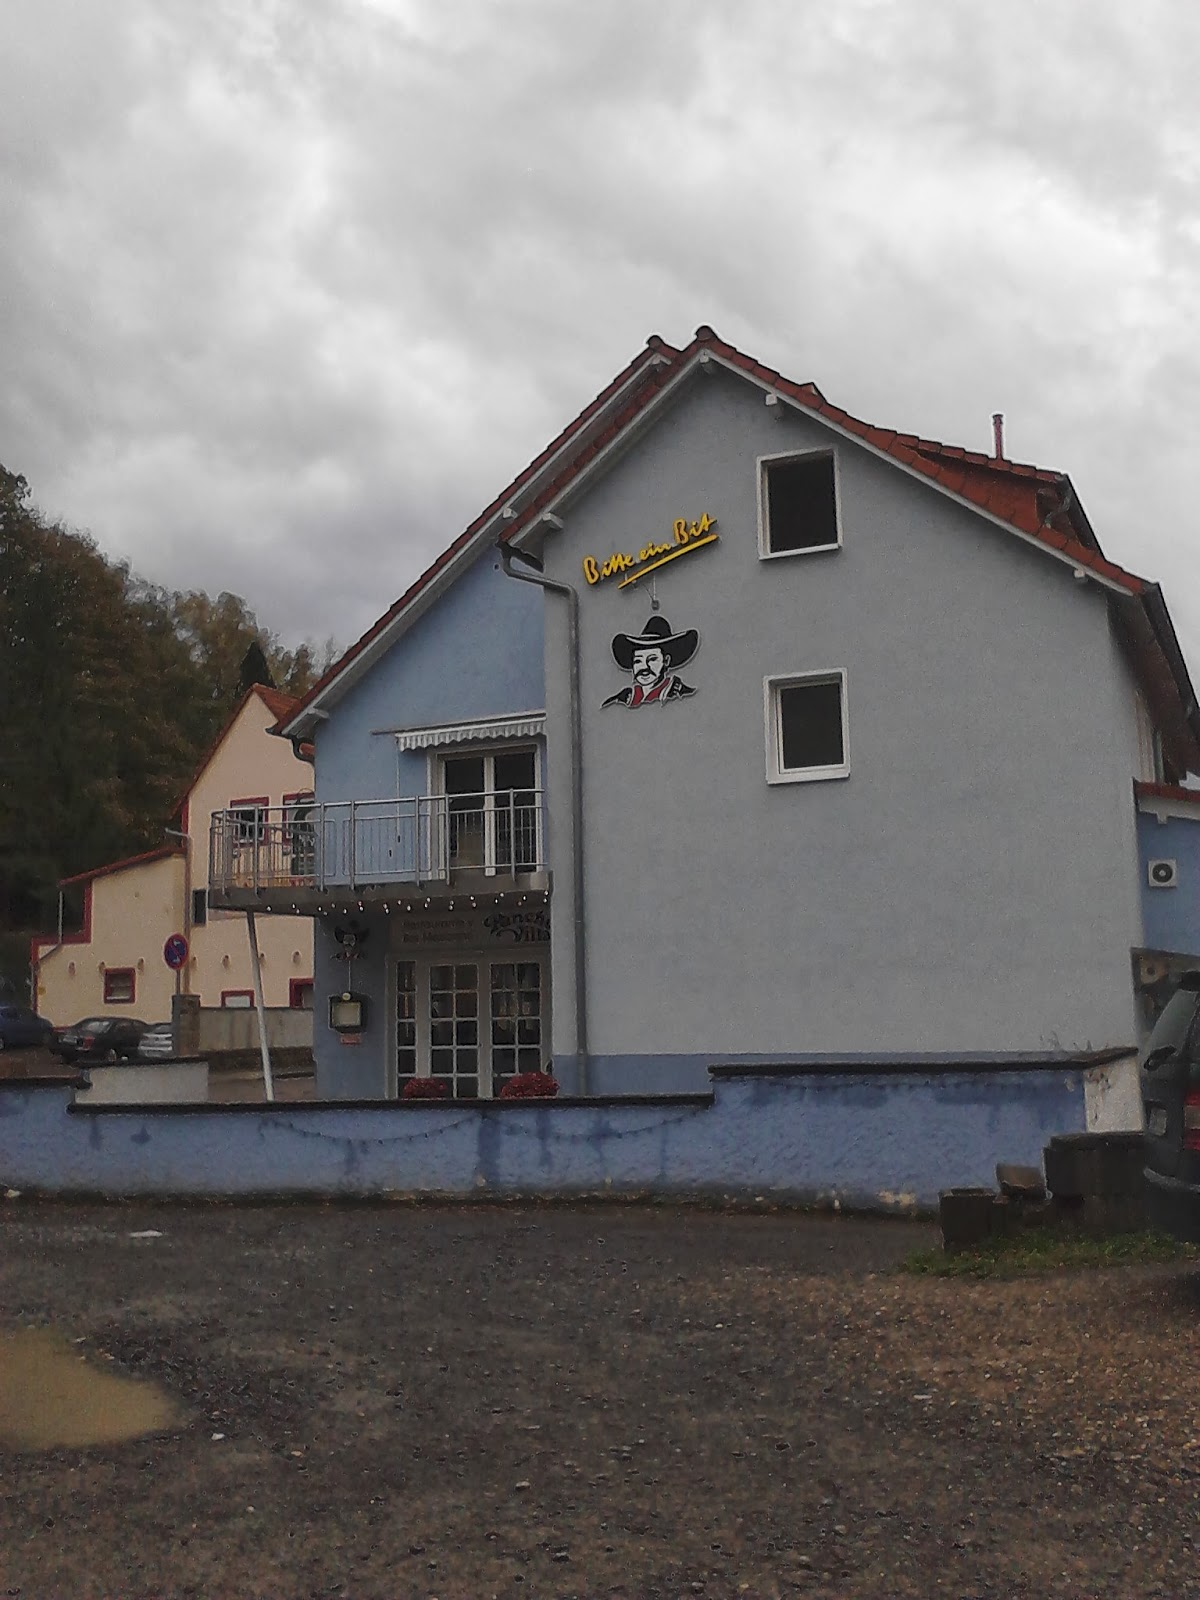 pancho villa ramstein